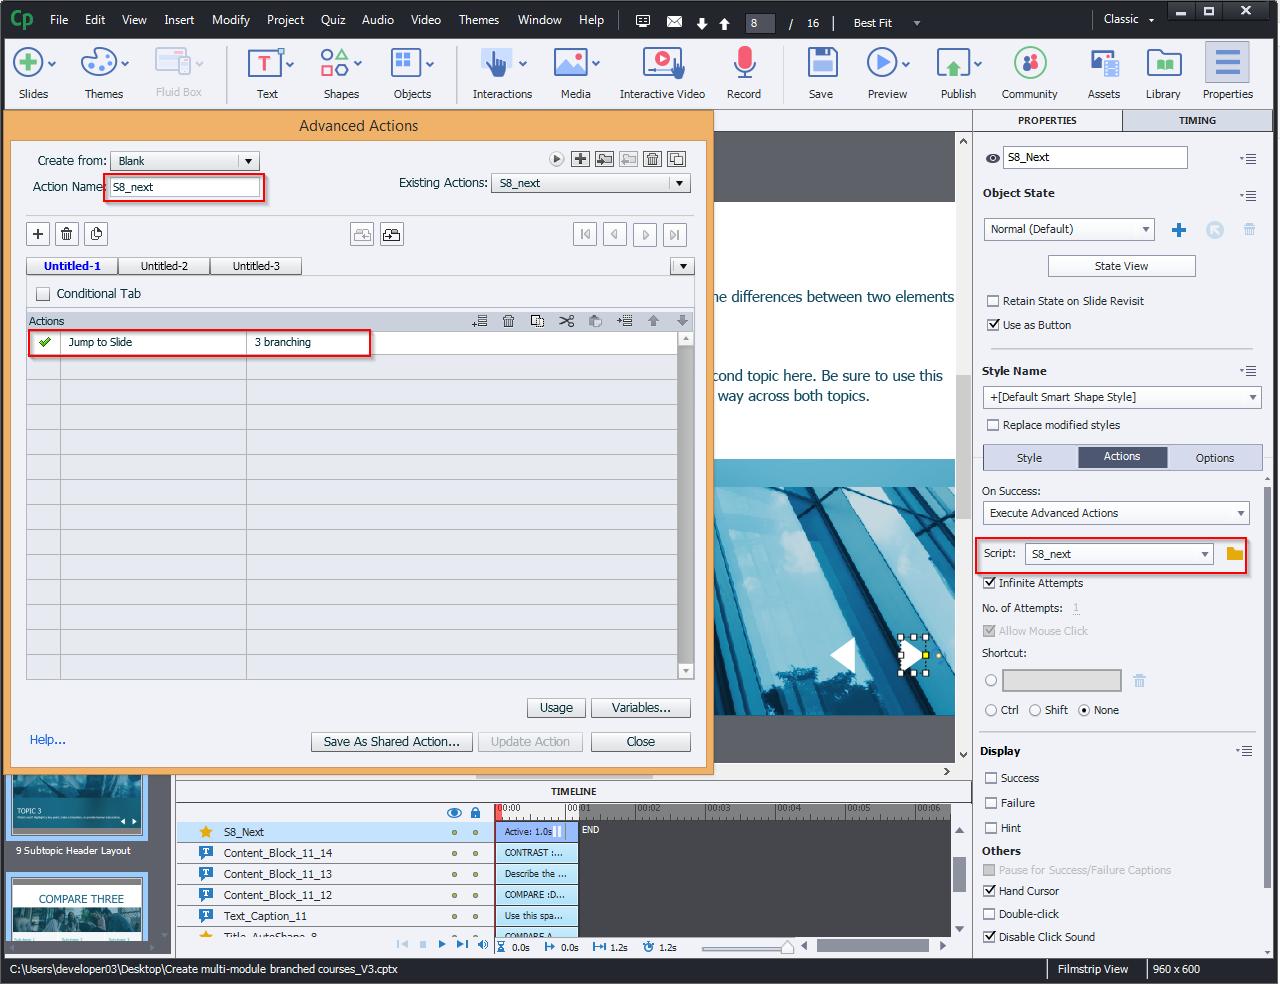 Create multi-module branched courses 12.1